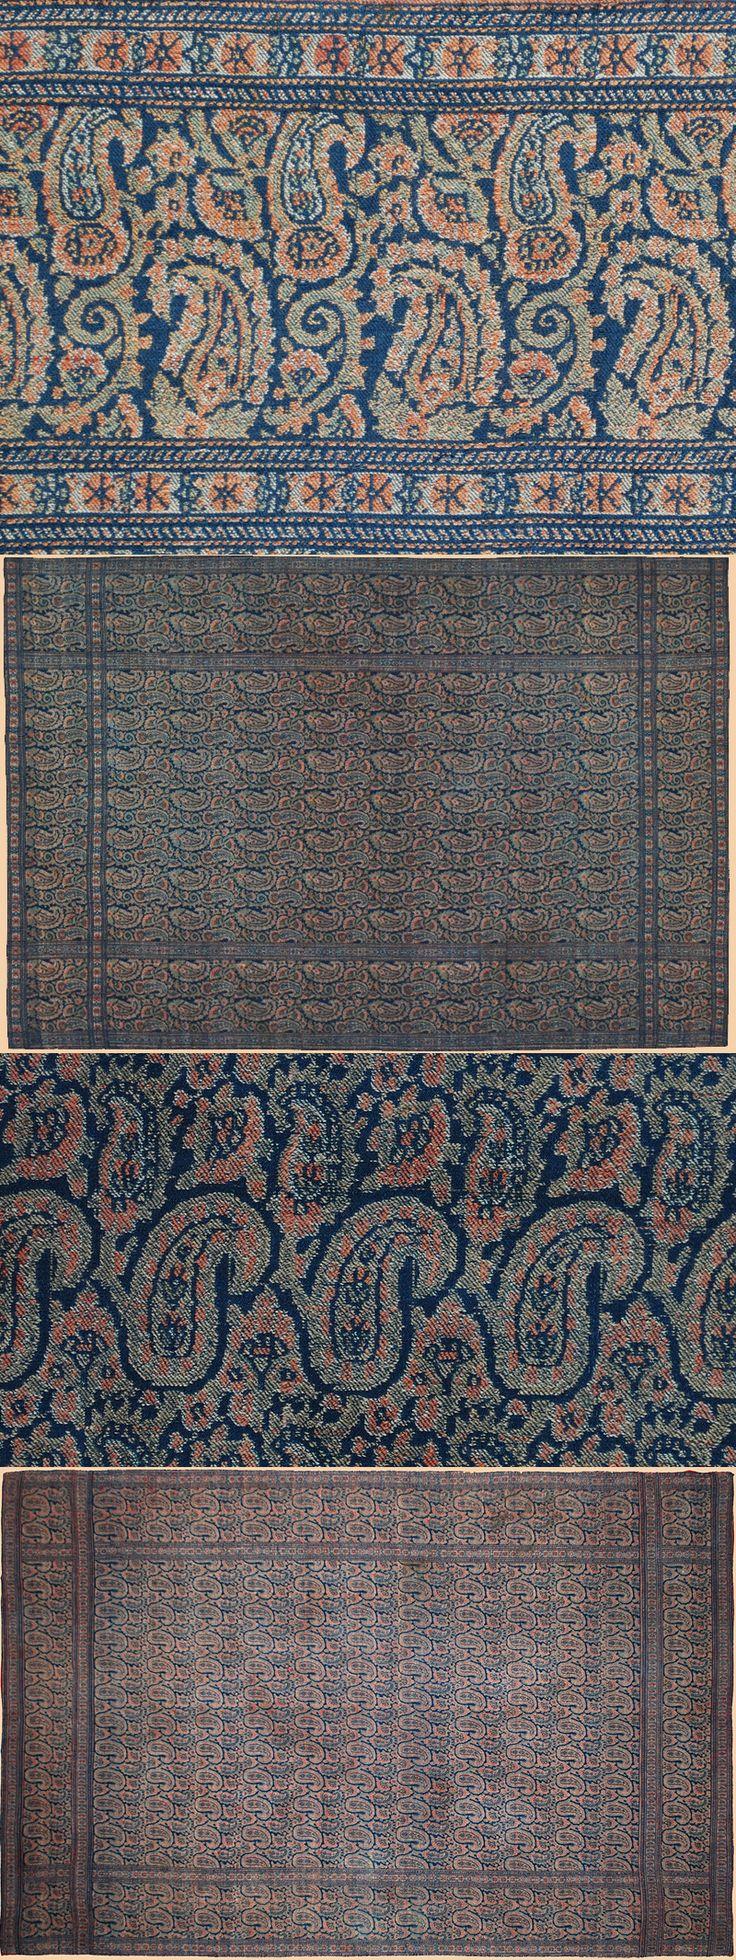 "Persian Shawls - TextileAsArt.com, Fine Antique Textiles and Antique Textile Information  Antique Persian Kerman Shawl Wool Termeh Qajar Dynasty 1795 -1925 A.D Circa 1850  Size 55"" x 34"" Size 140 x 87cm"